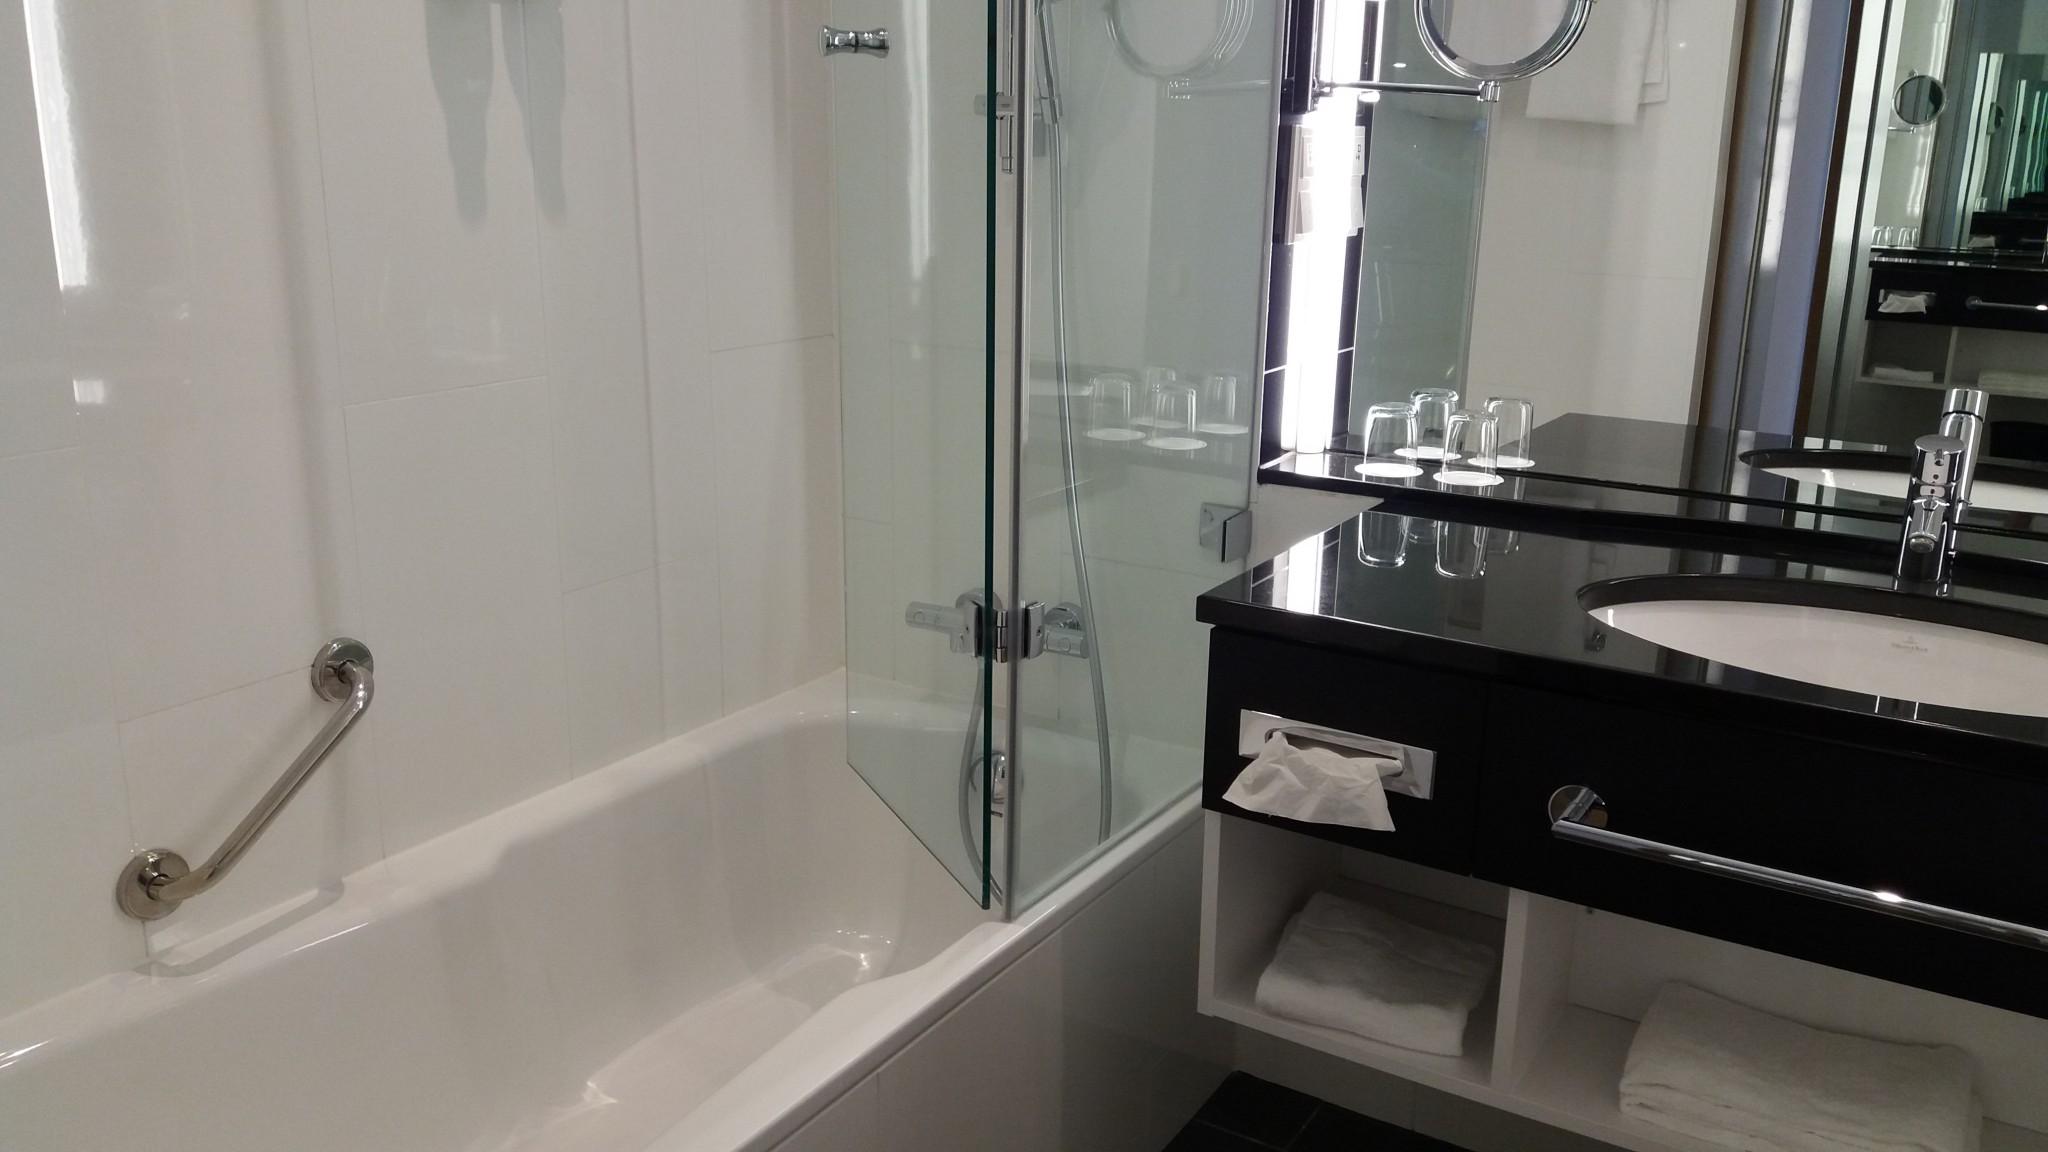 Four Points by Sheraton Panoramahaus Dornbirn Bathroom